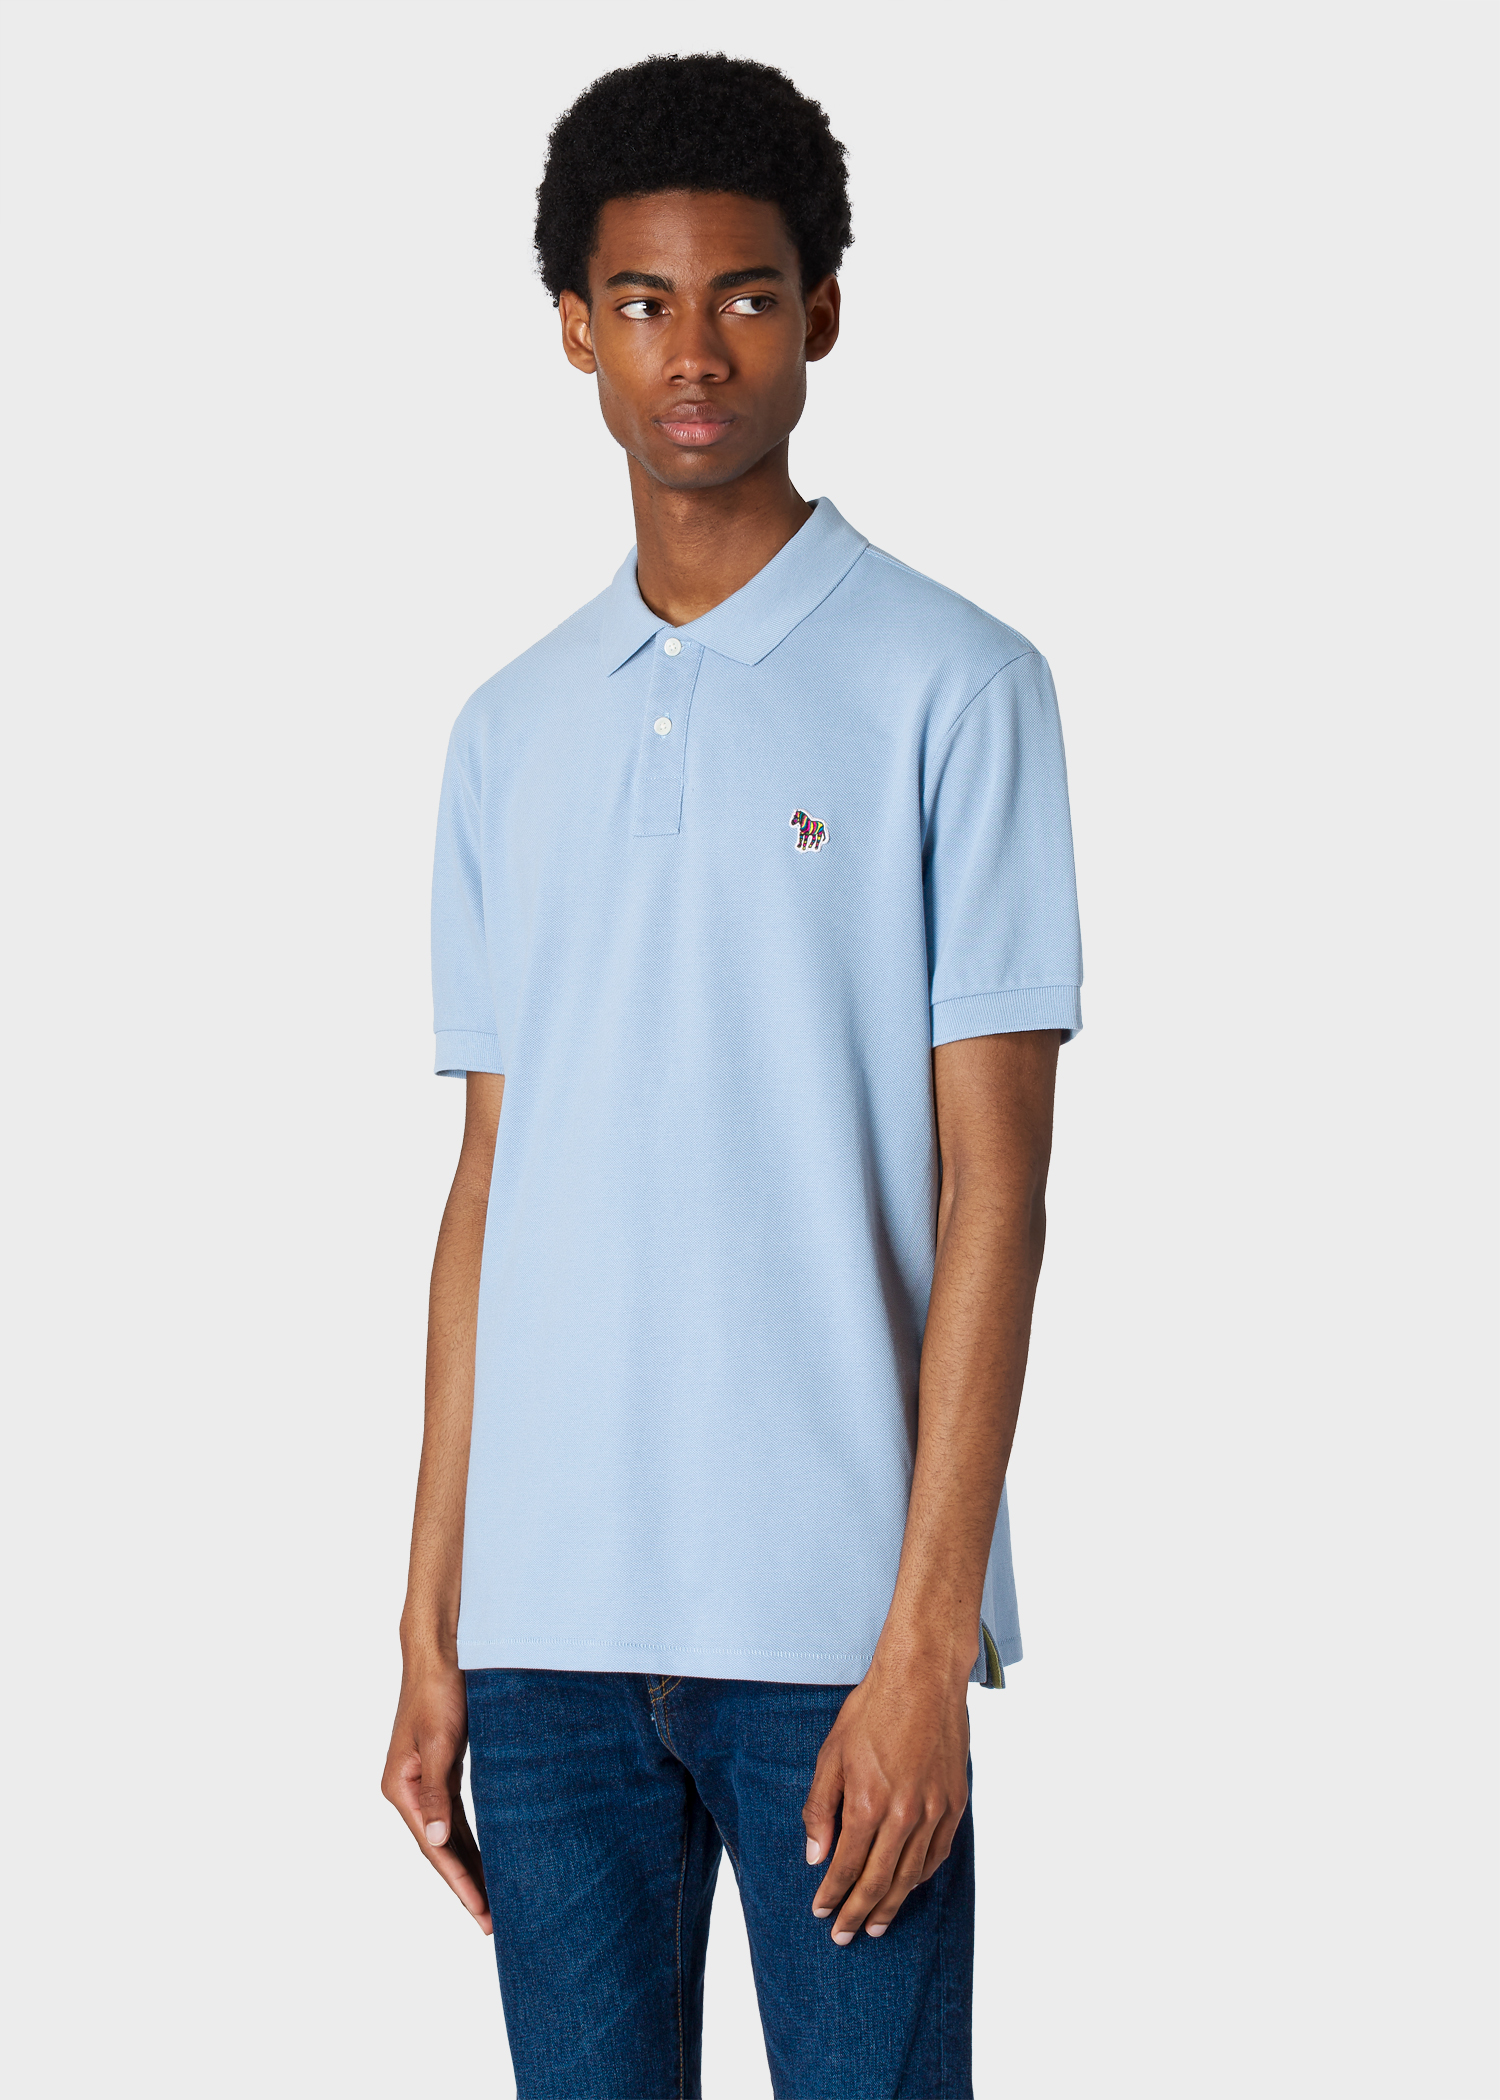 5d77a7f9 Model front close up - Men's Light Blue Organic Cotton-Piqué Zebra Logo  Polo Shirt